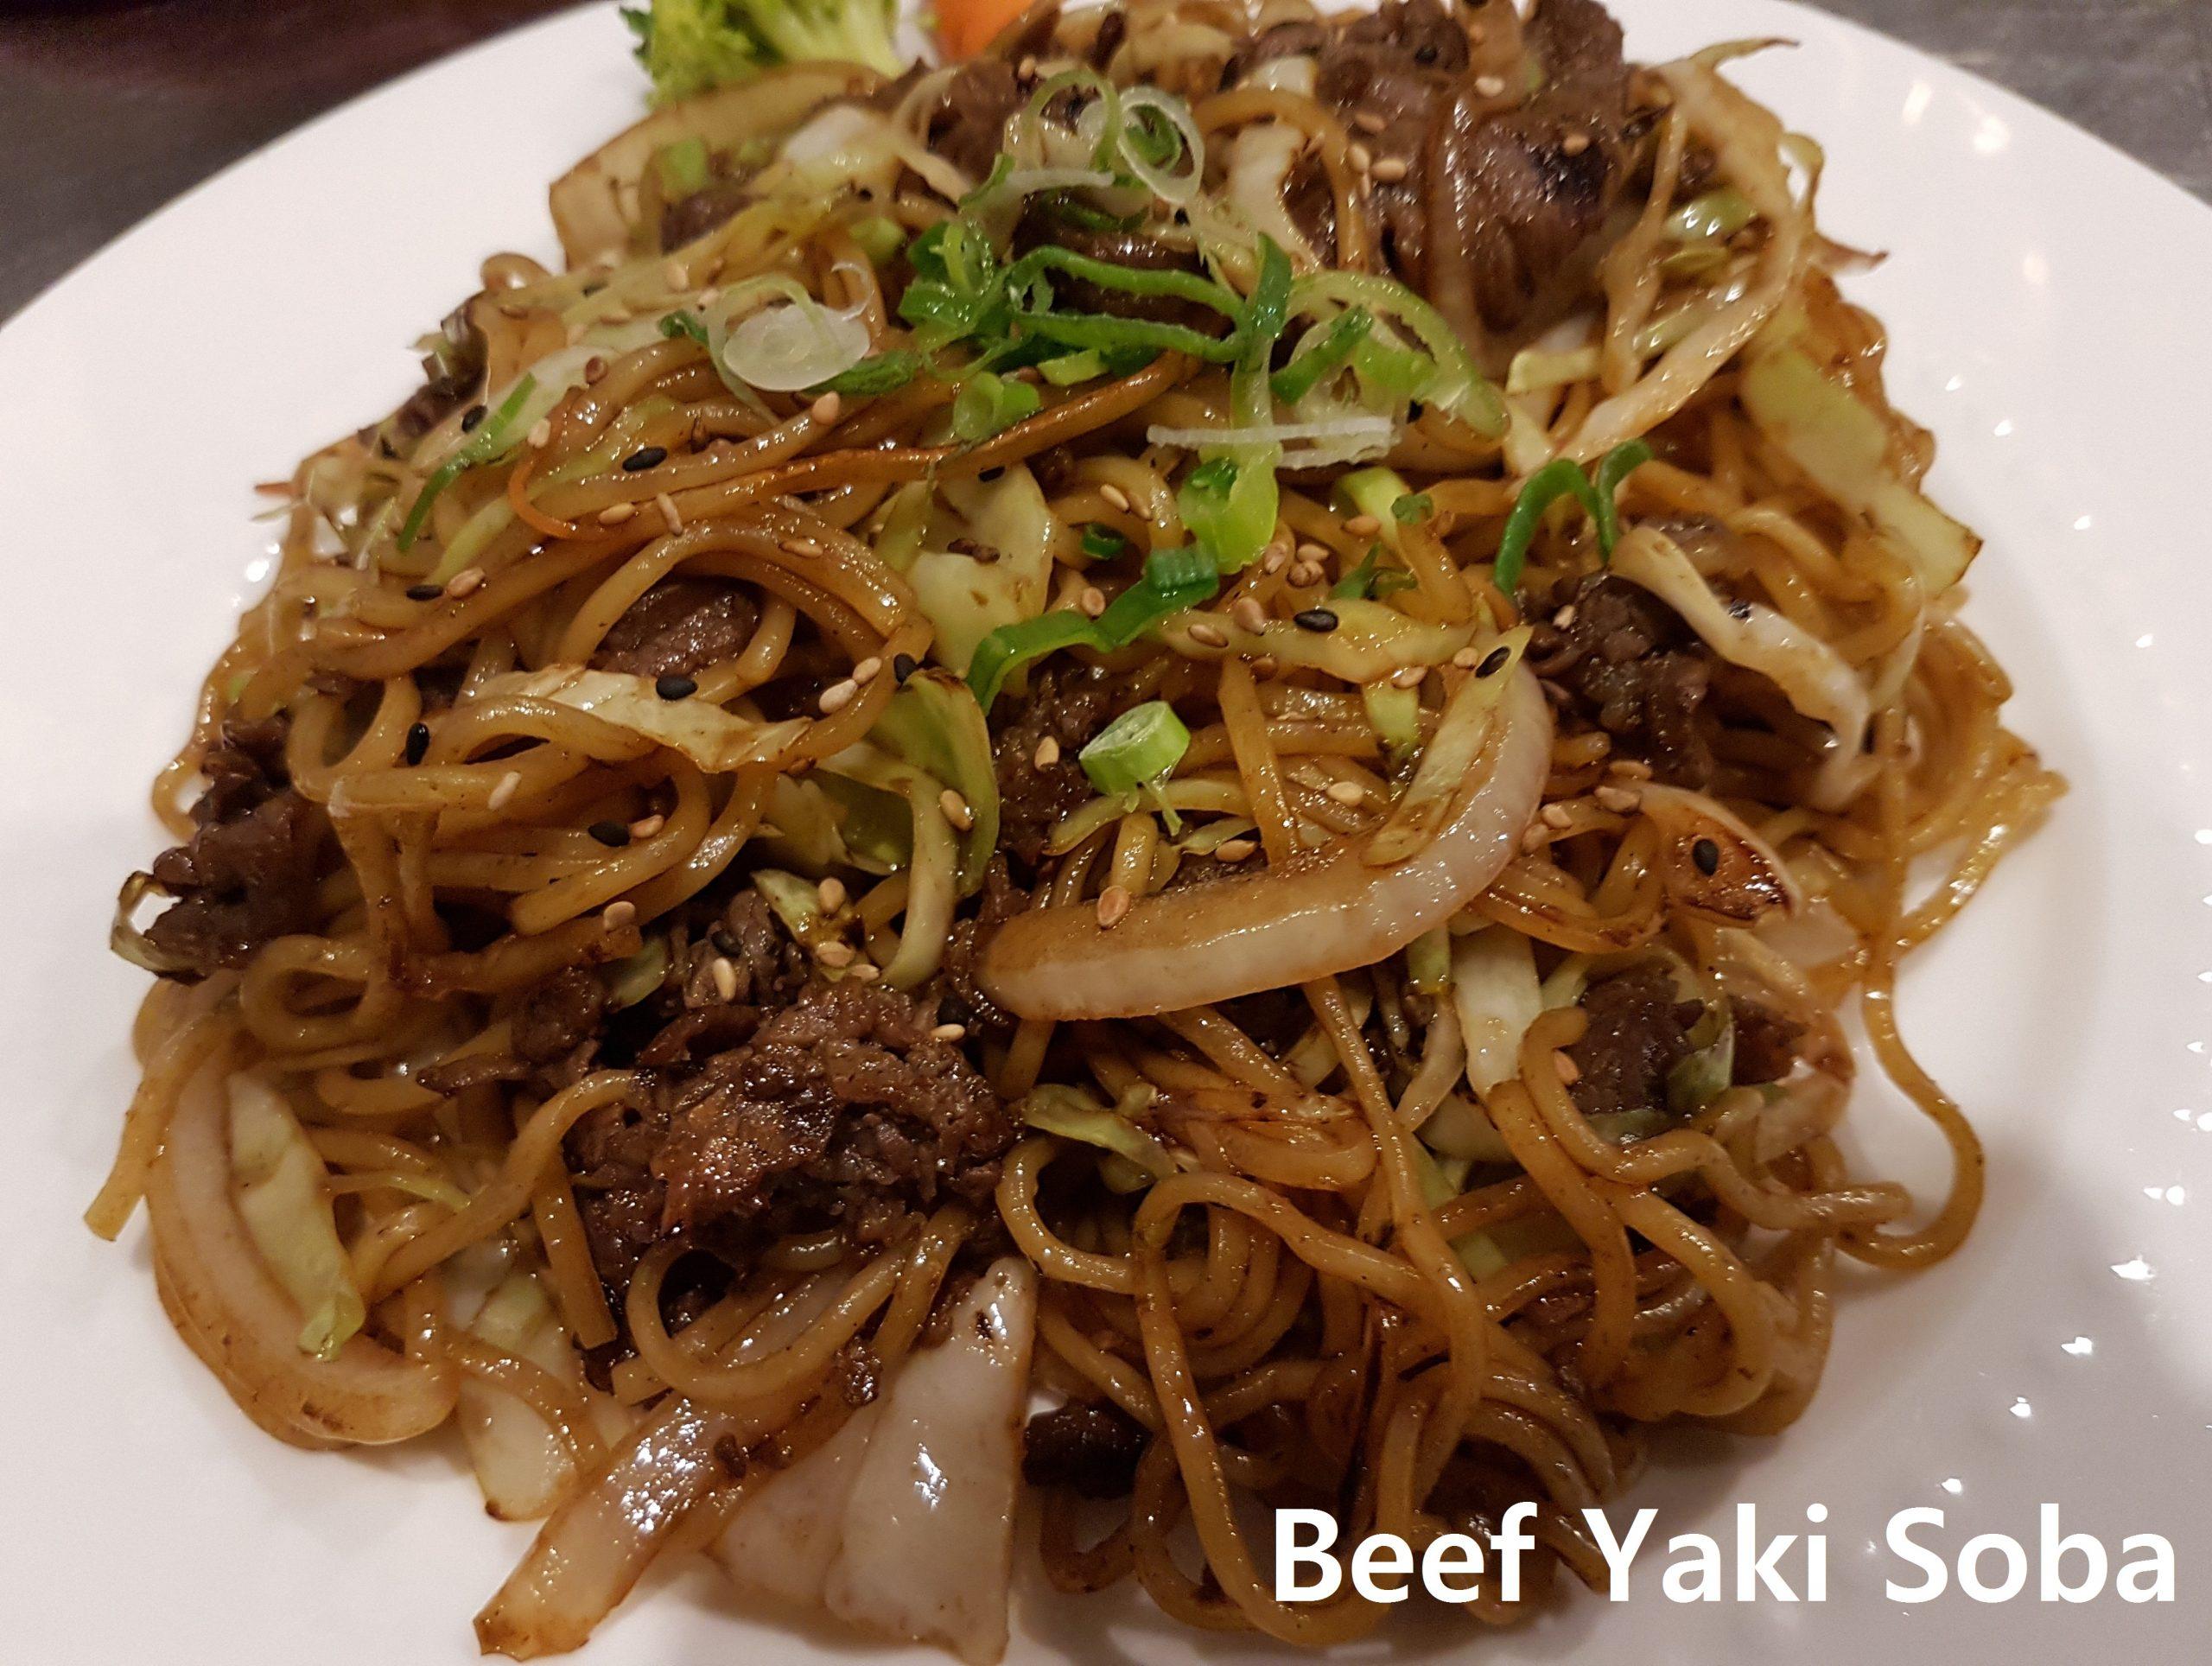 Beef yaki soba(n)